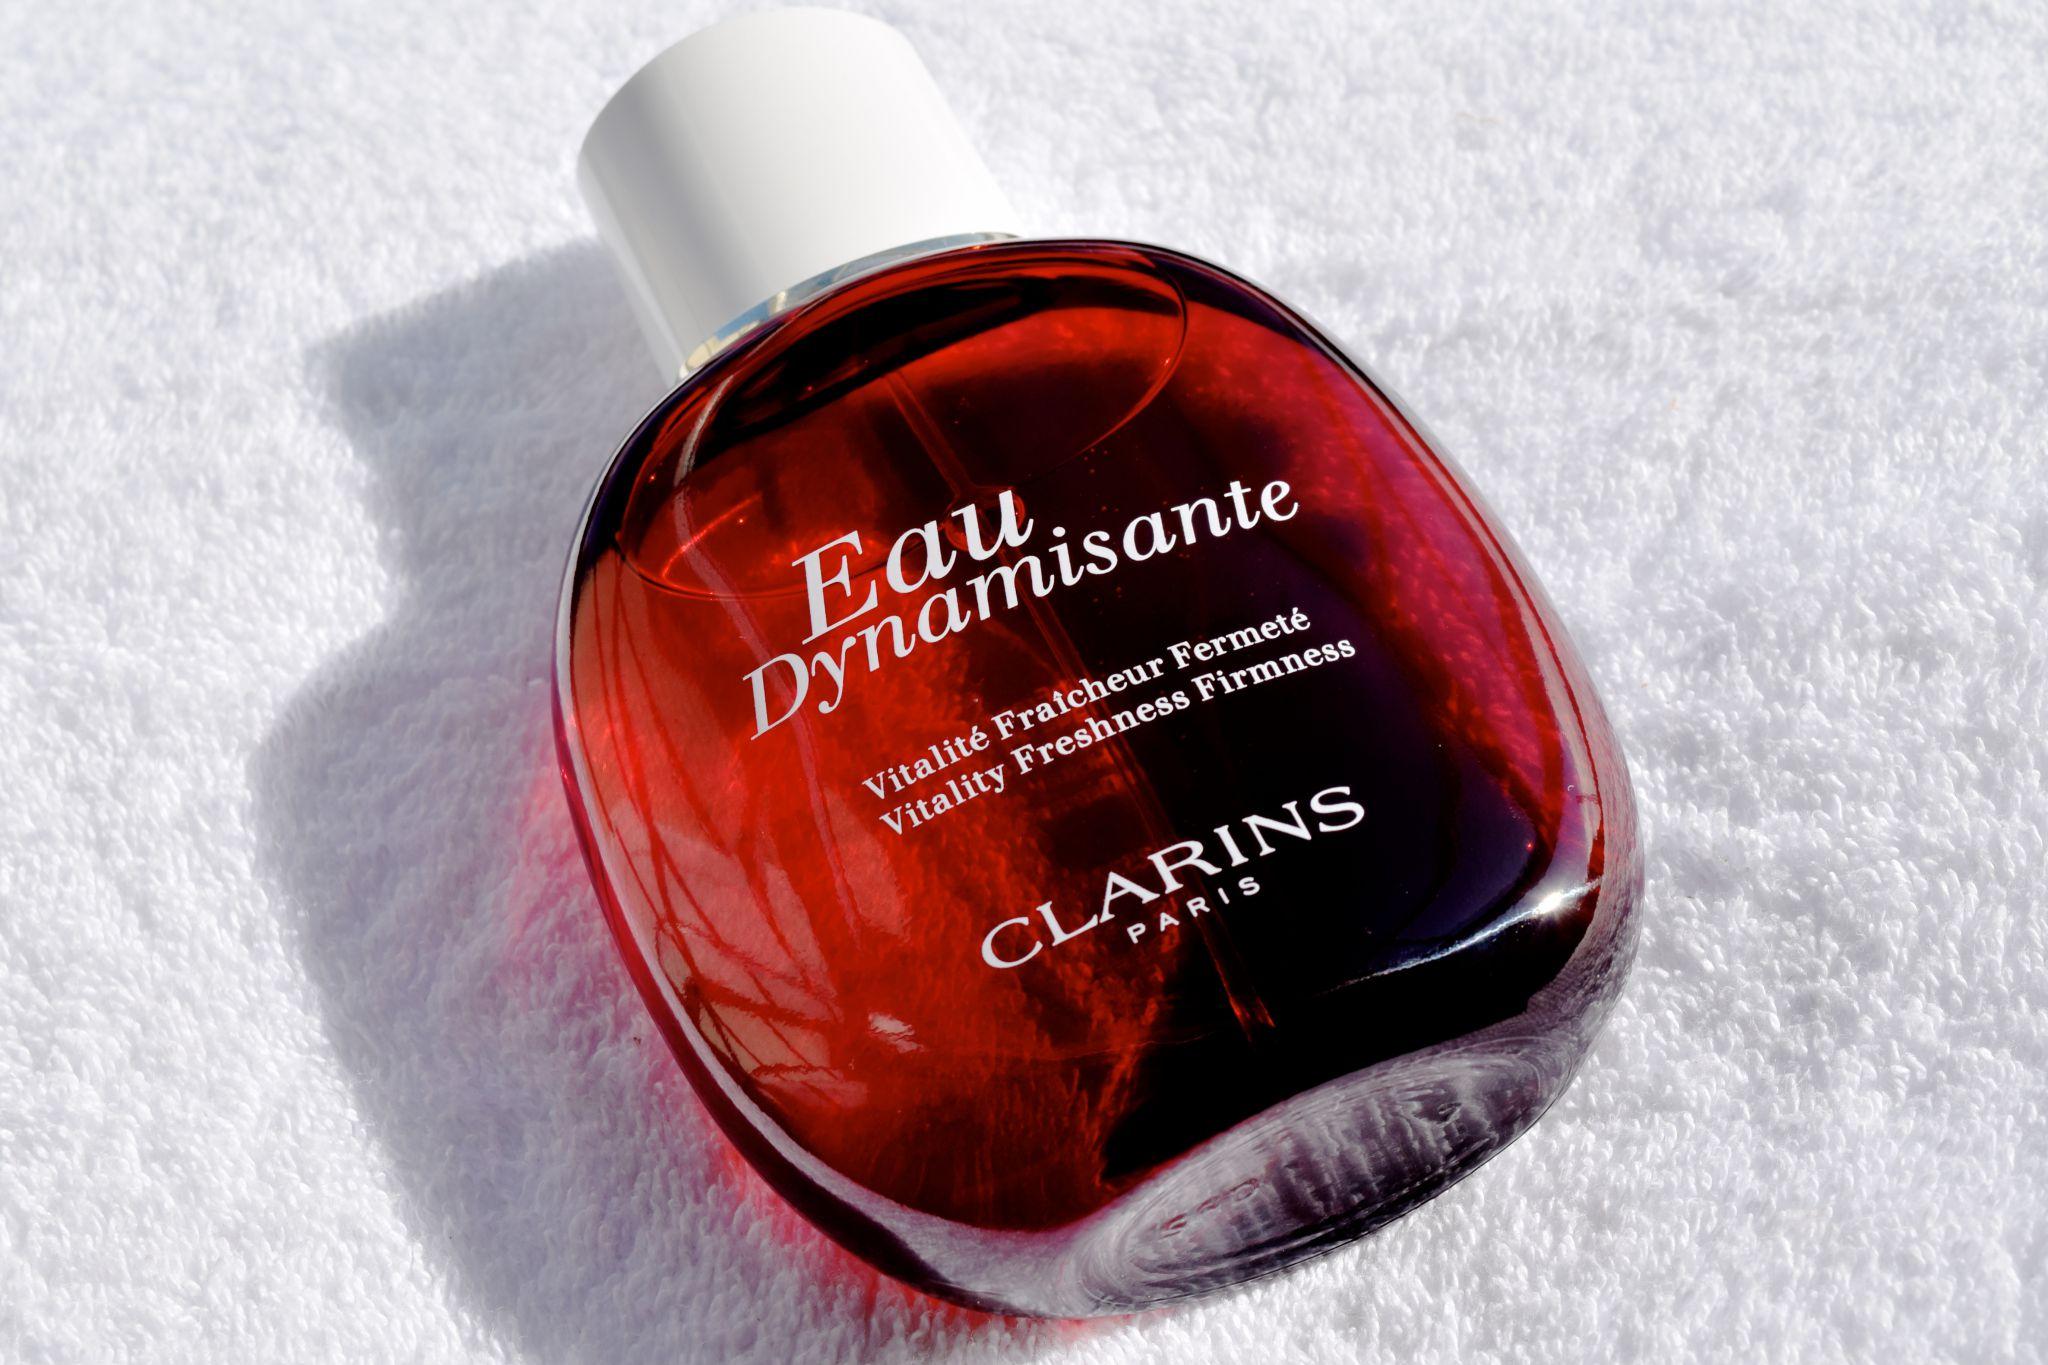 Clarins Eau Dynamisant Review